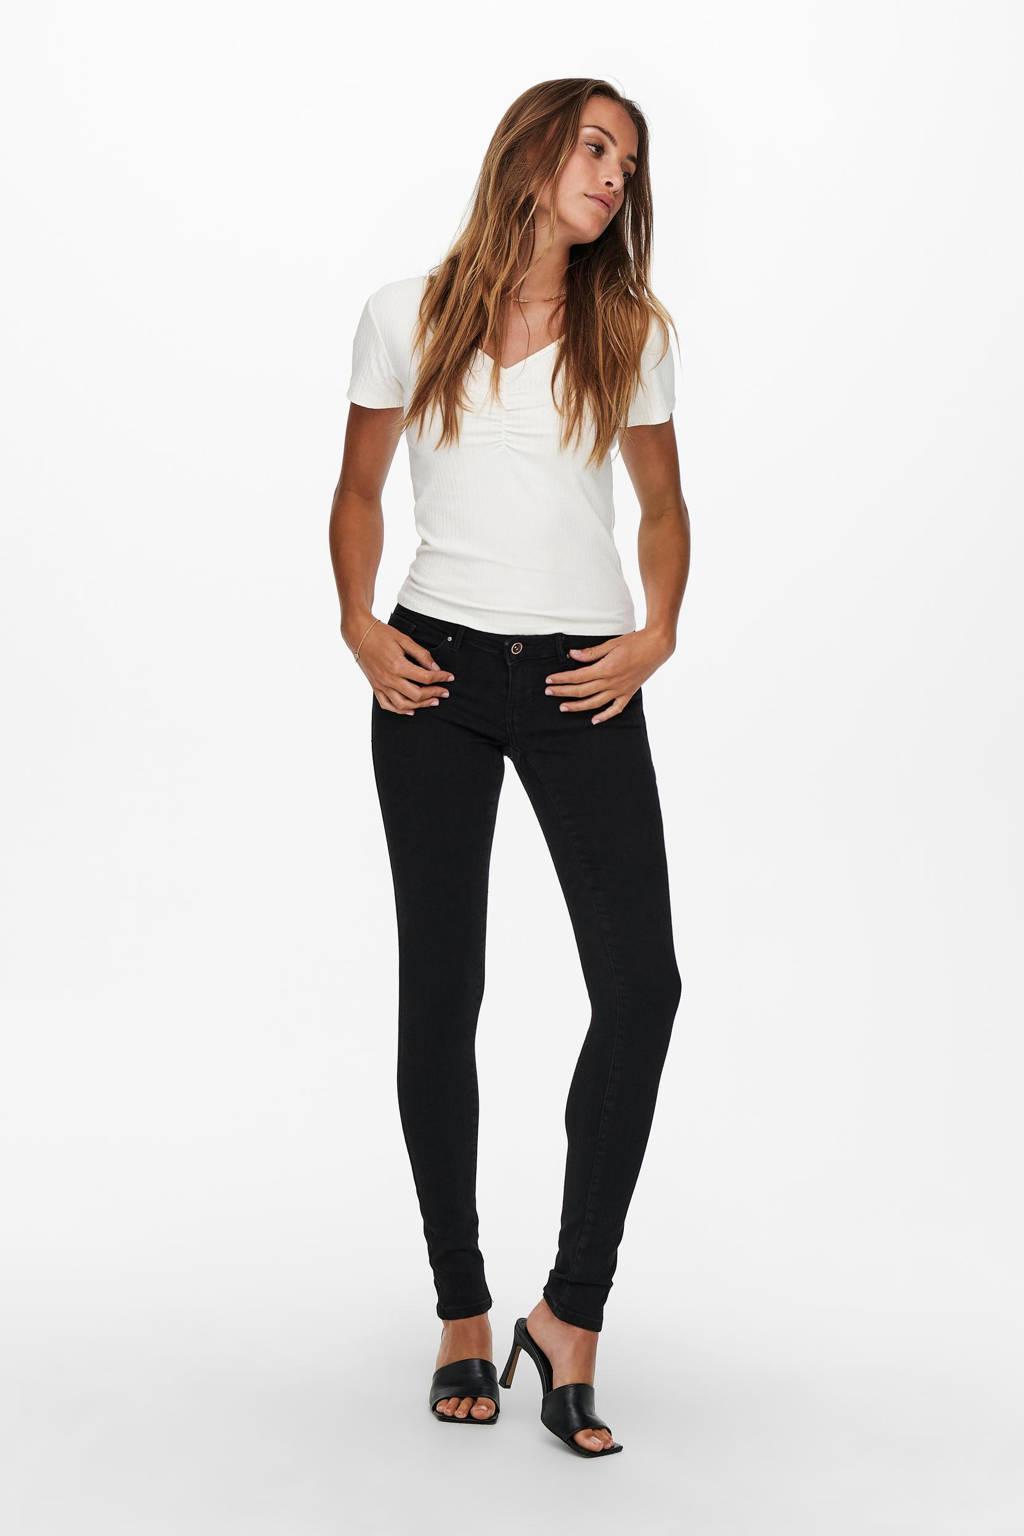 ONLY extra low waist skinny jeans ONLCORAL black denim, Black denim